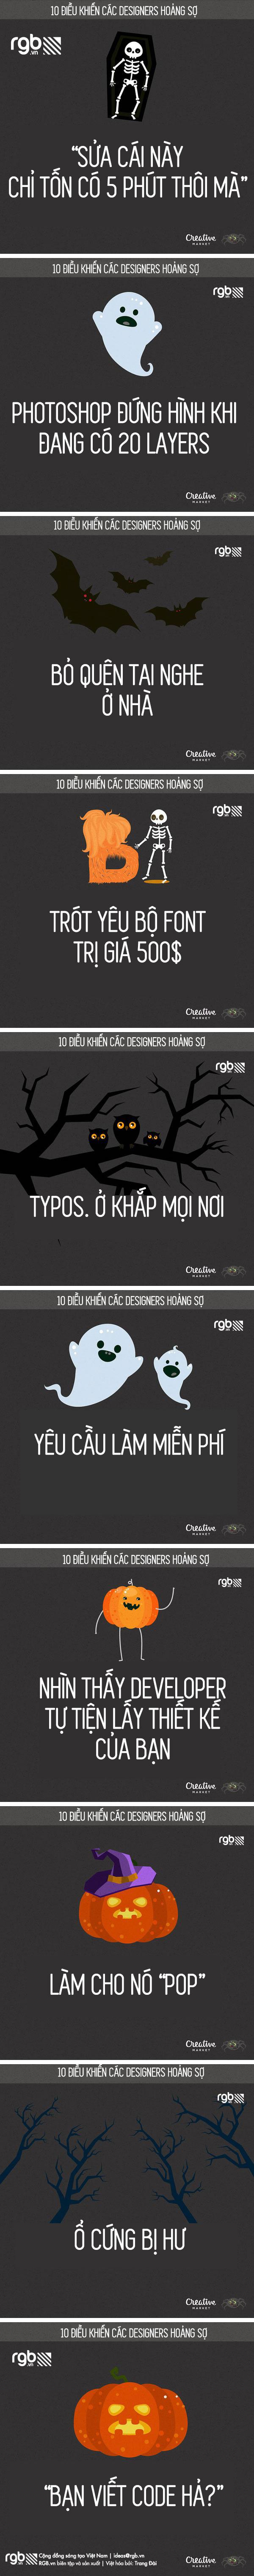 rgb.vn_10-dieu-khien-designers-hoang-so